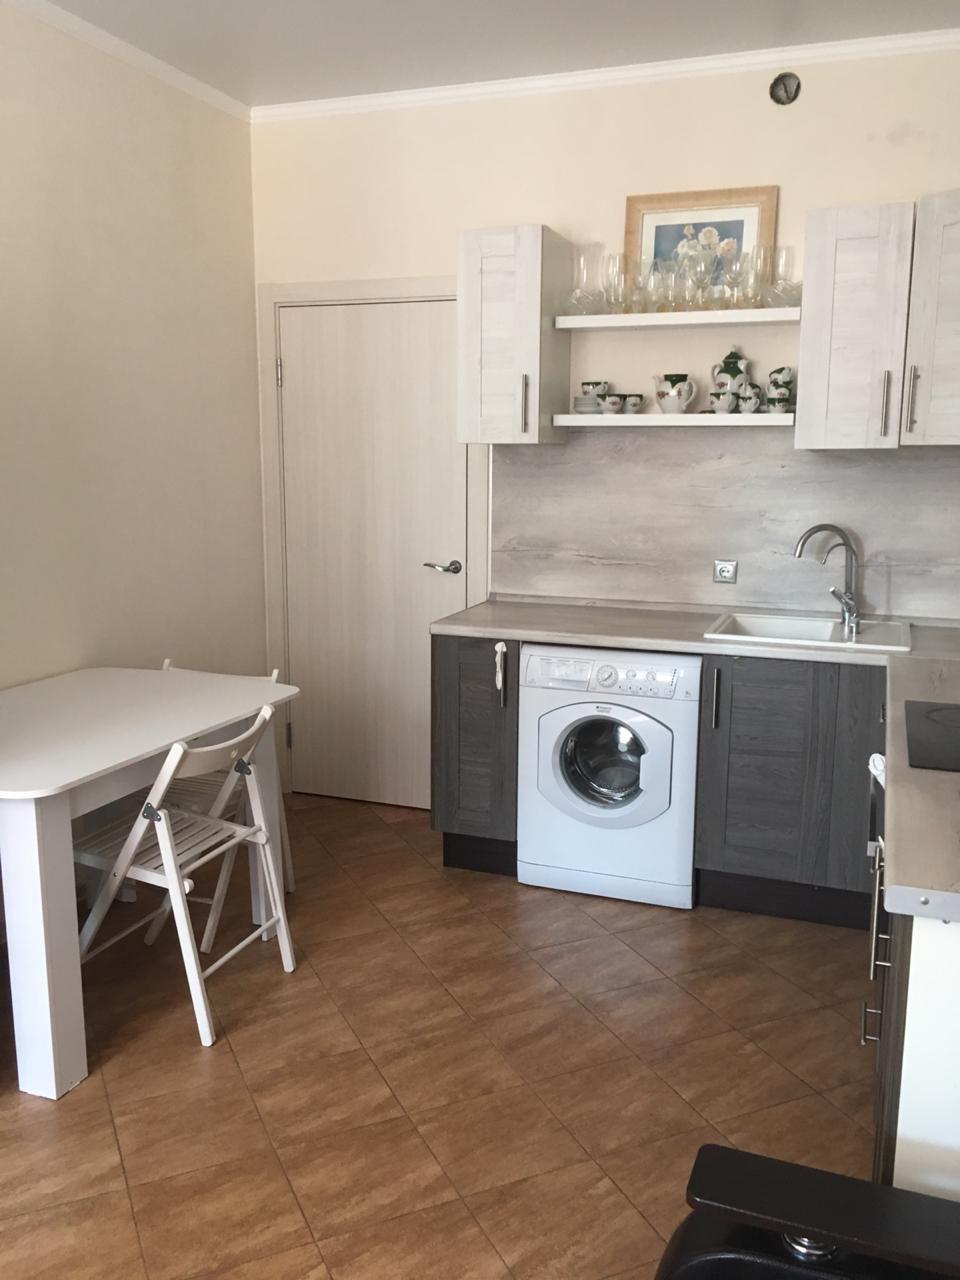 Квартира, 1 комната, 47 м² в Коммунарке 89055769697 купить 4